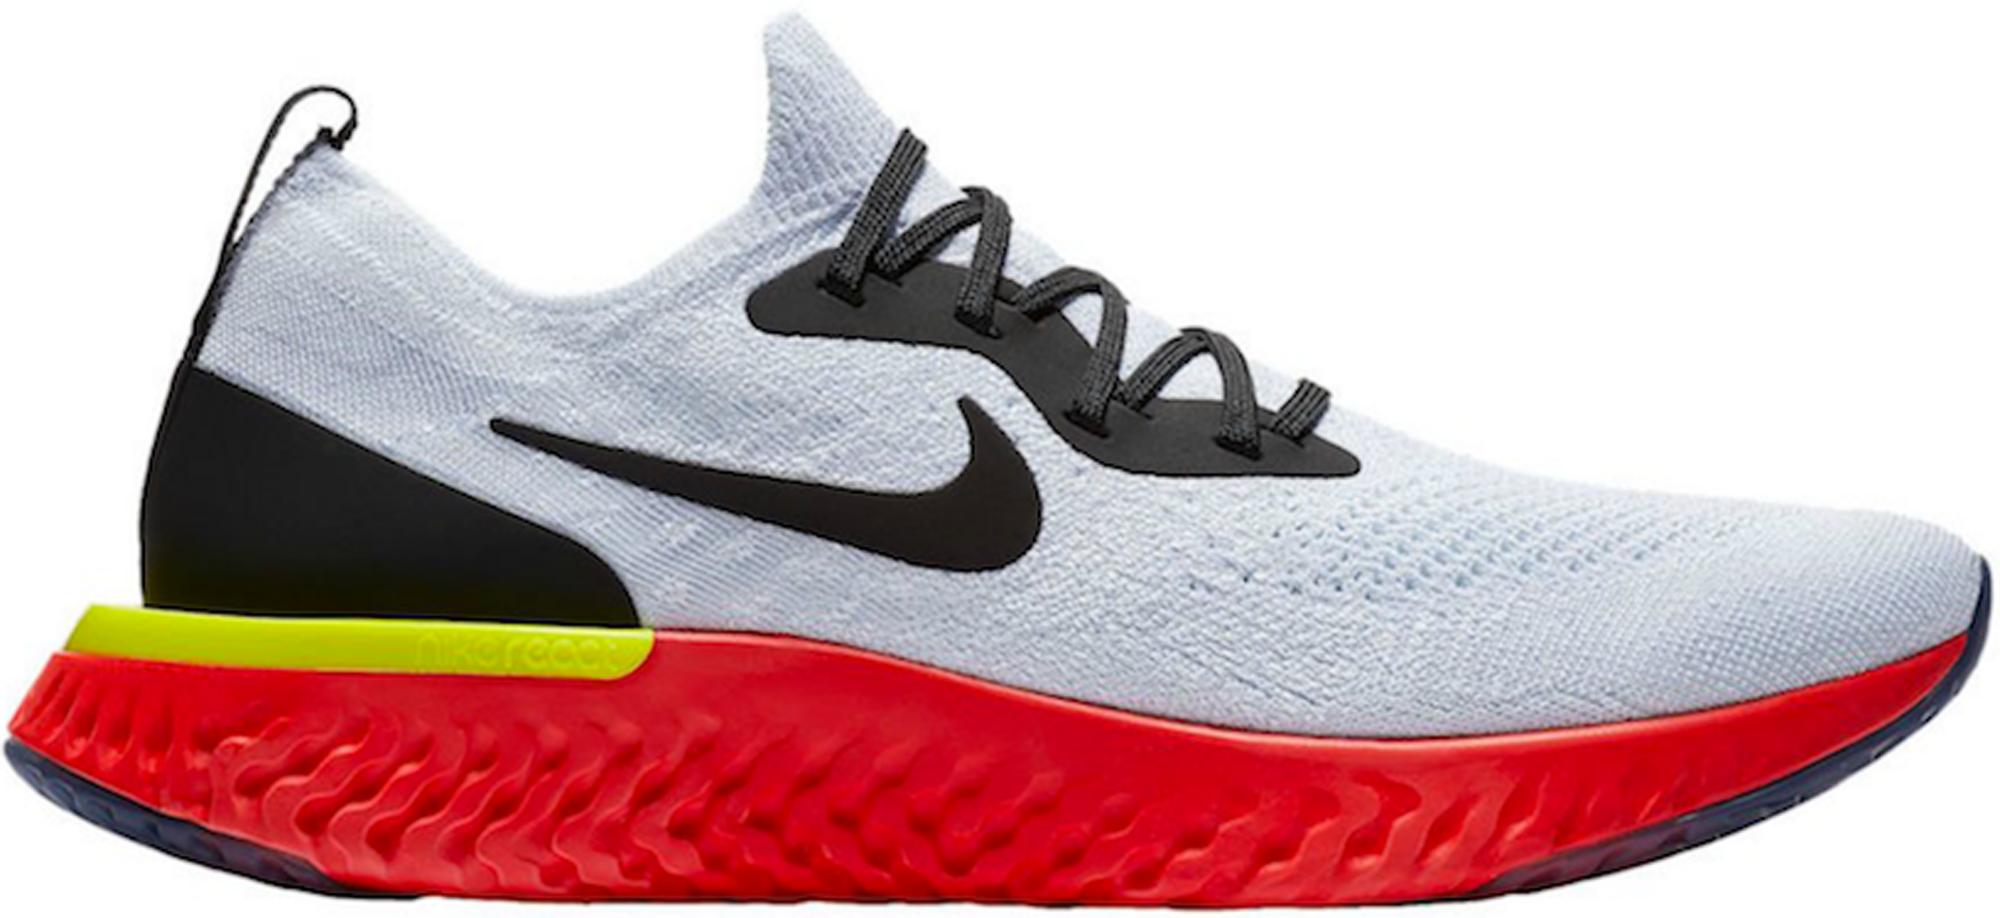 Nike Epic React Flyknit White Bright